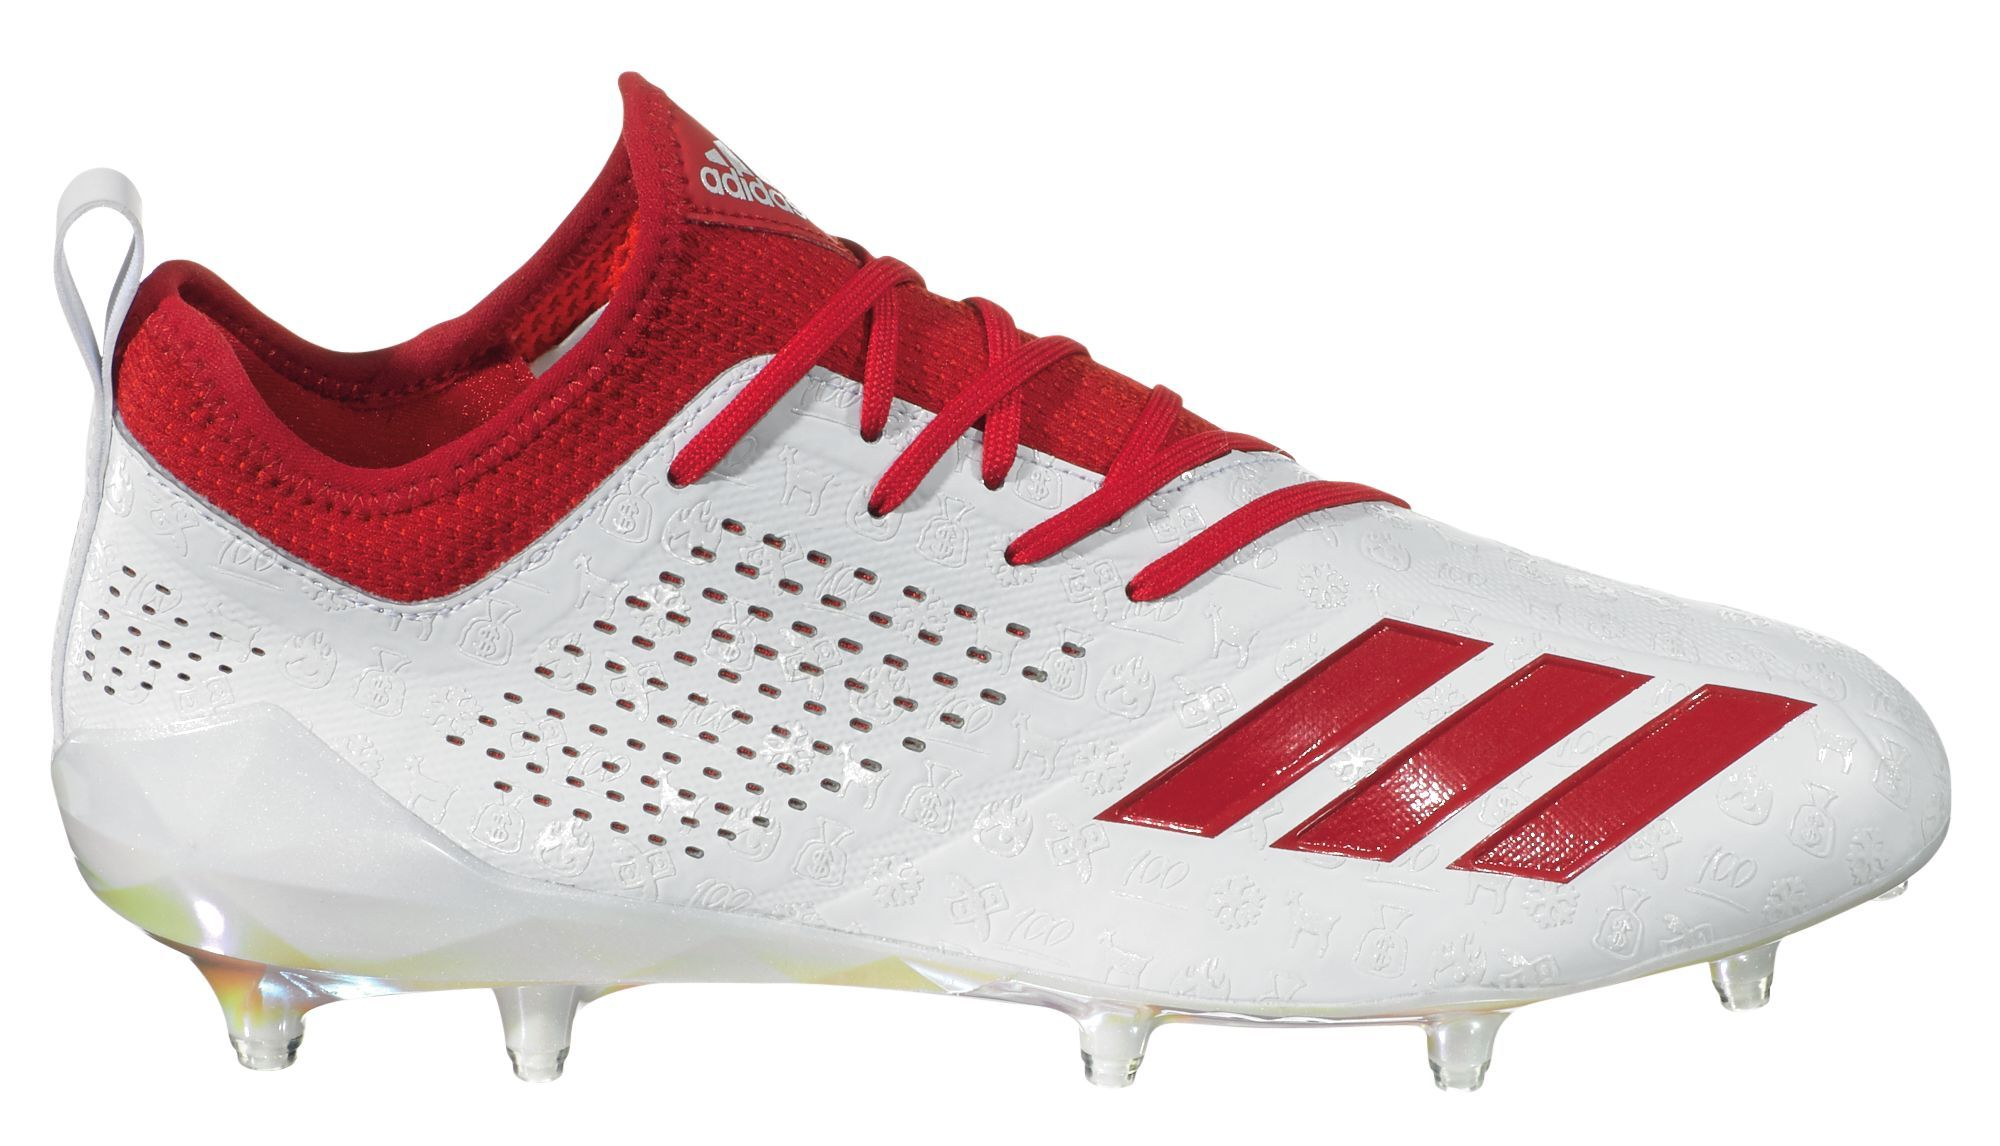 c950b4b83 adidas Men's adiZERO 5-Star 7.0 adiMoji Pack Football Cleats, Size: 17,  White